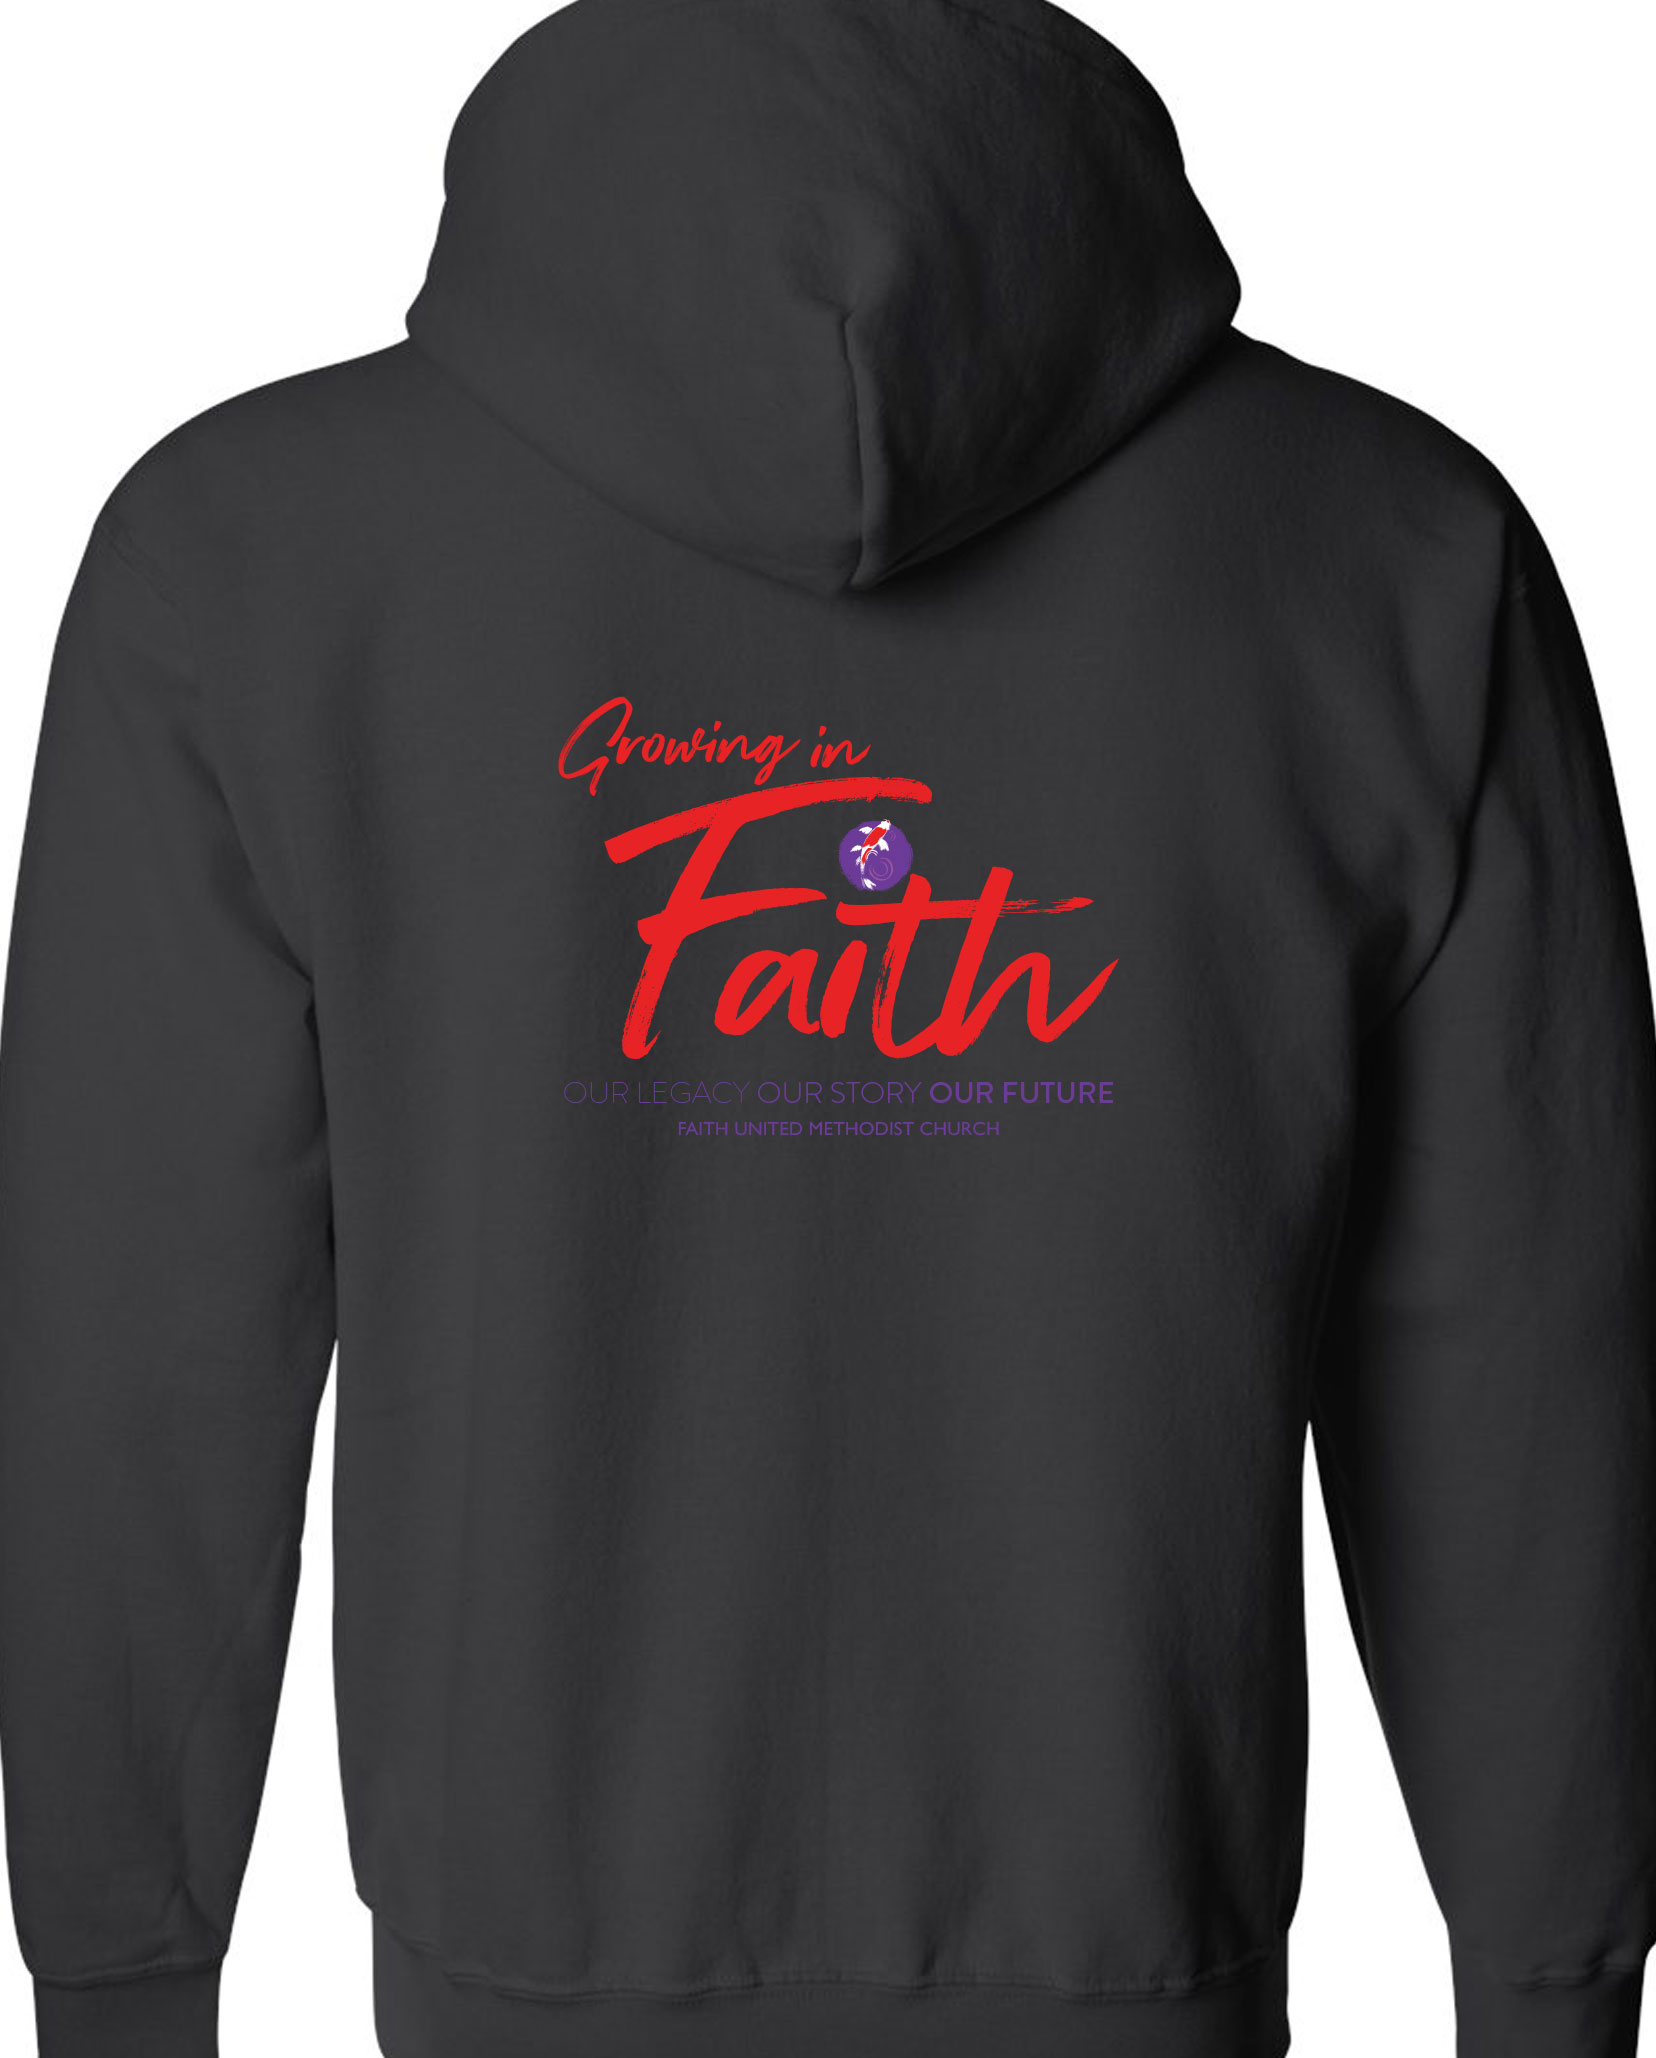 Faith UMC 60th Anniversary Full-Zip Jacket With Hoodie